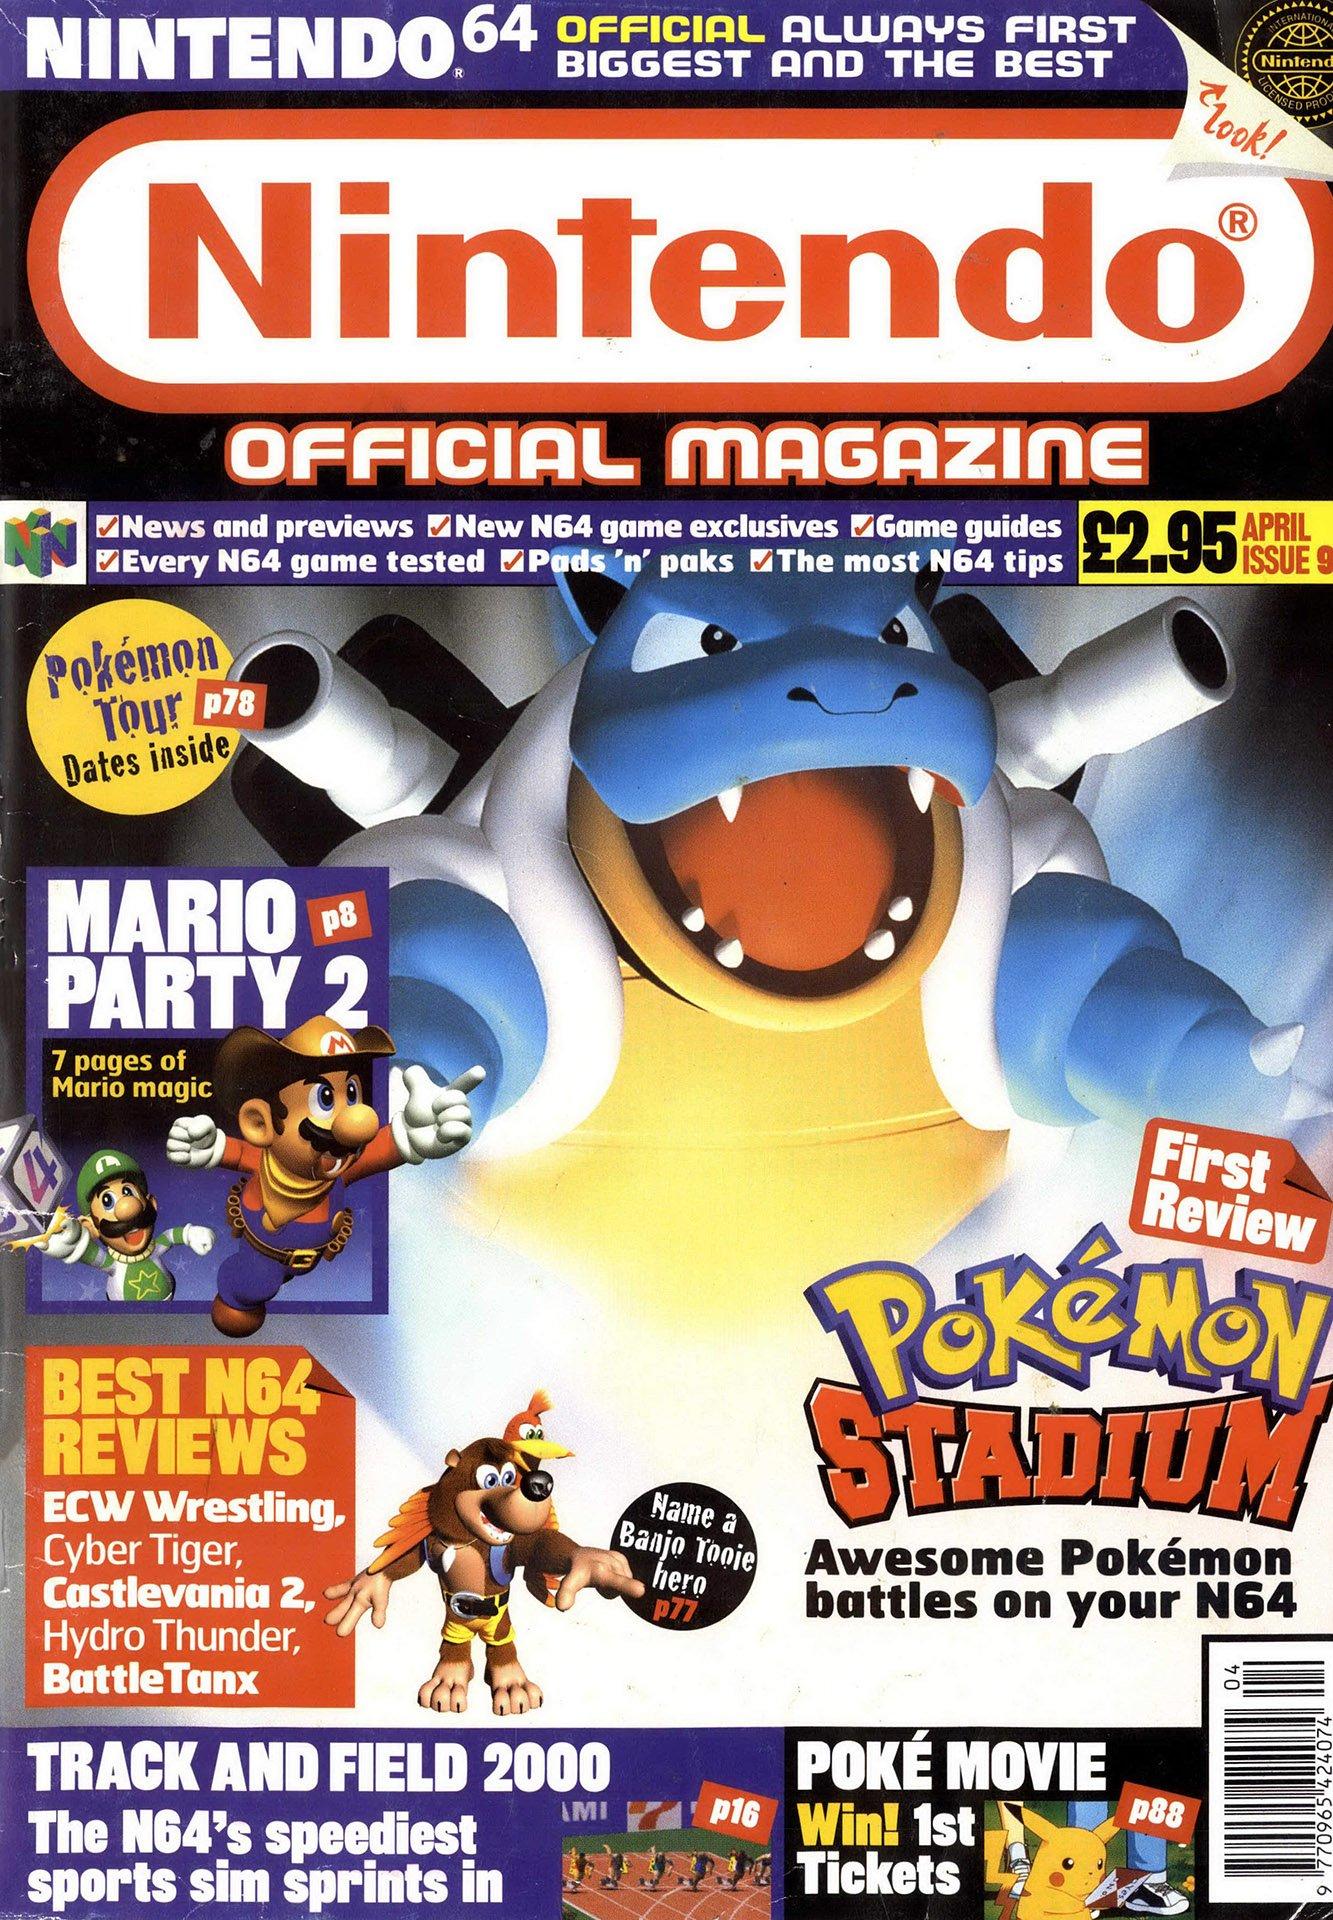 Nintendo Official Magazine 091 (April 2000)